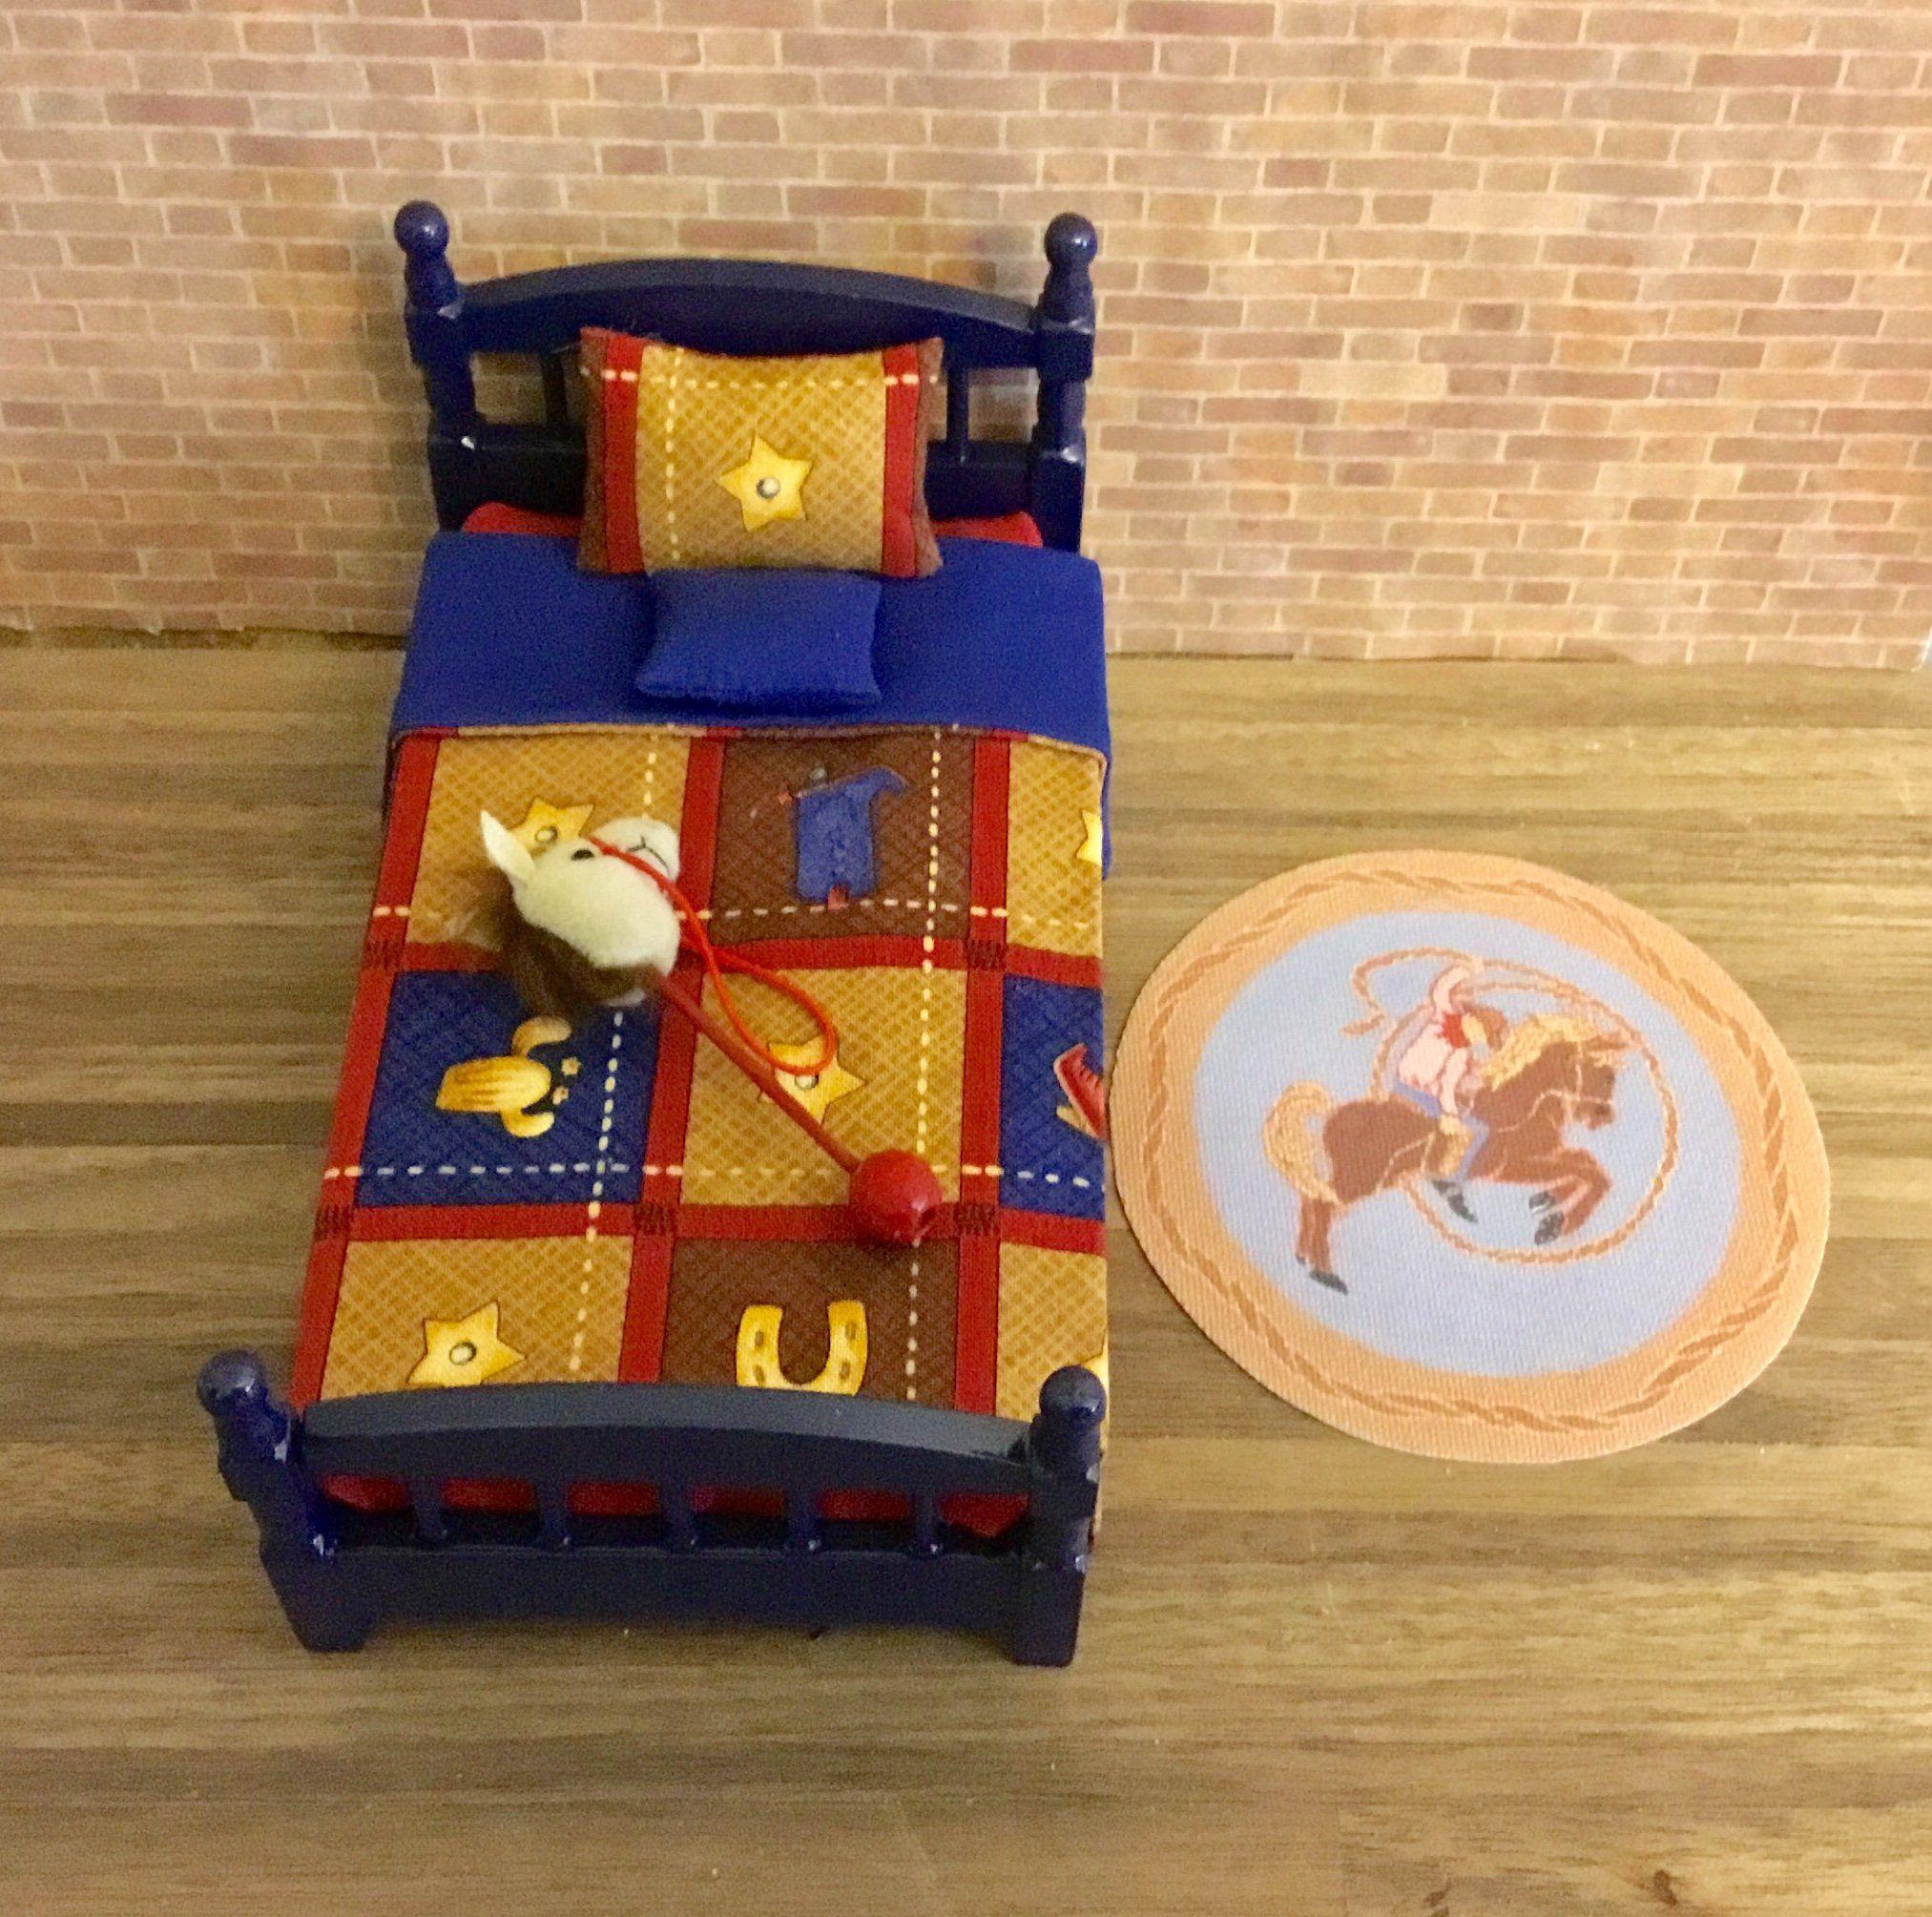 1:12 Dollhouse Miniature Carpet Dollhouse Room Accessories De sa